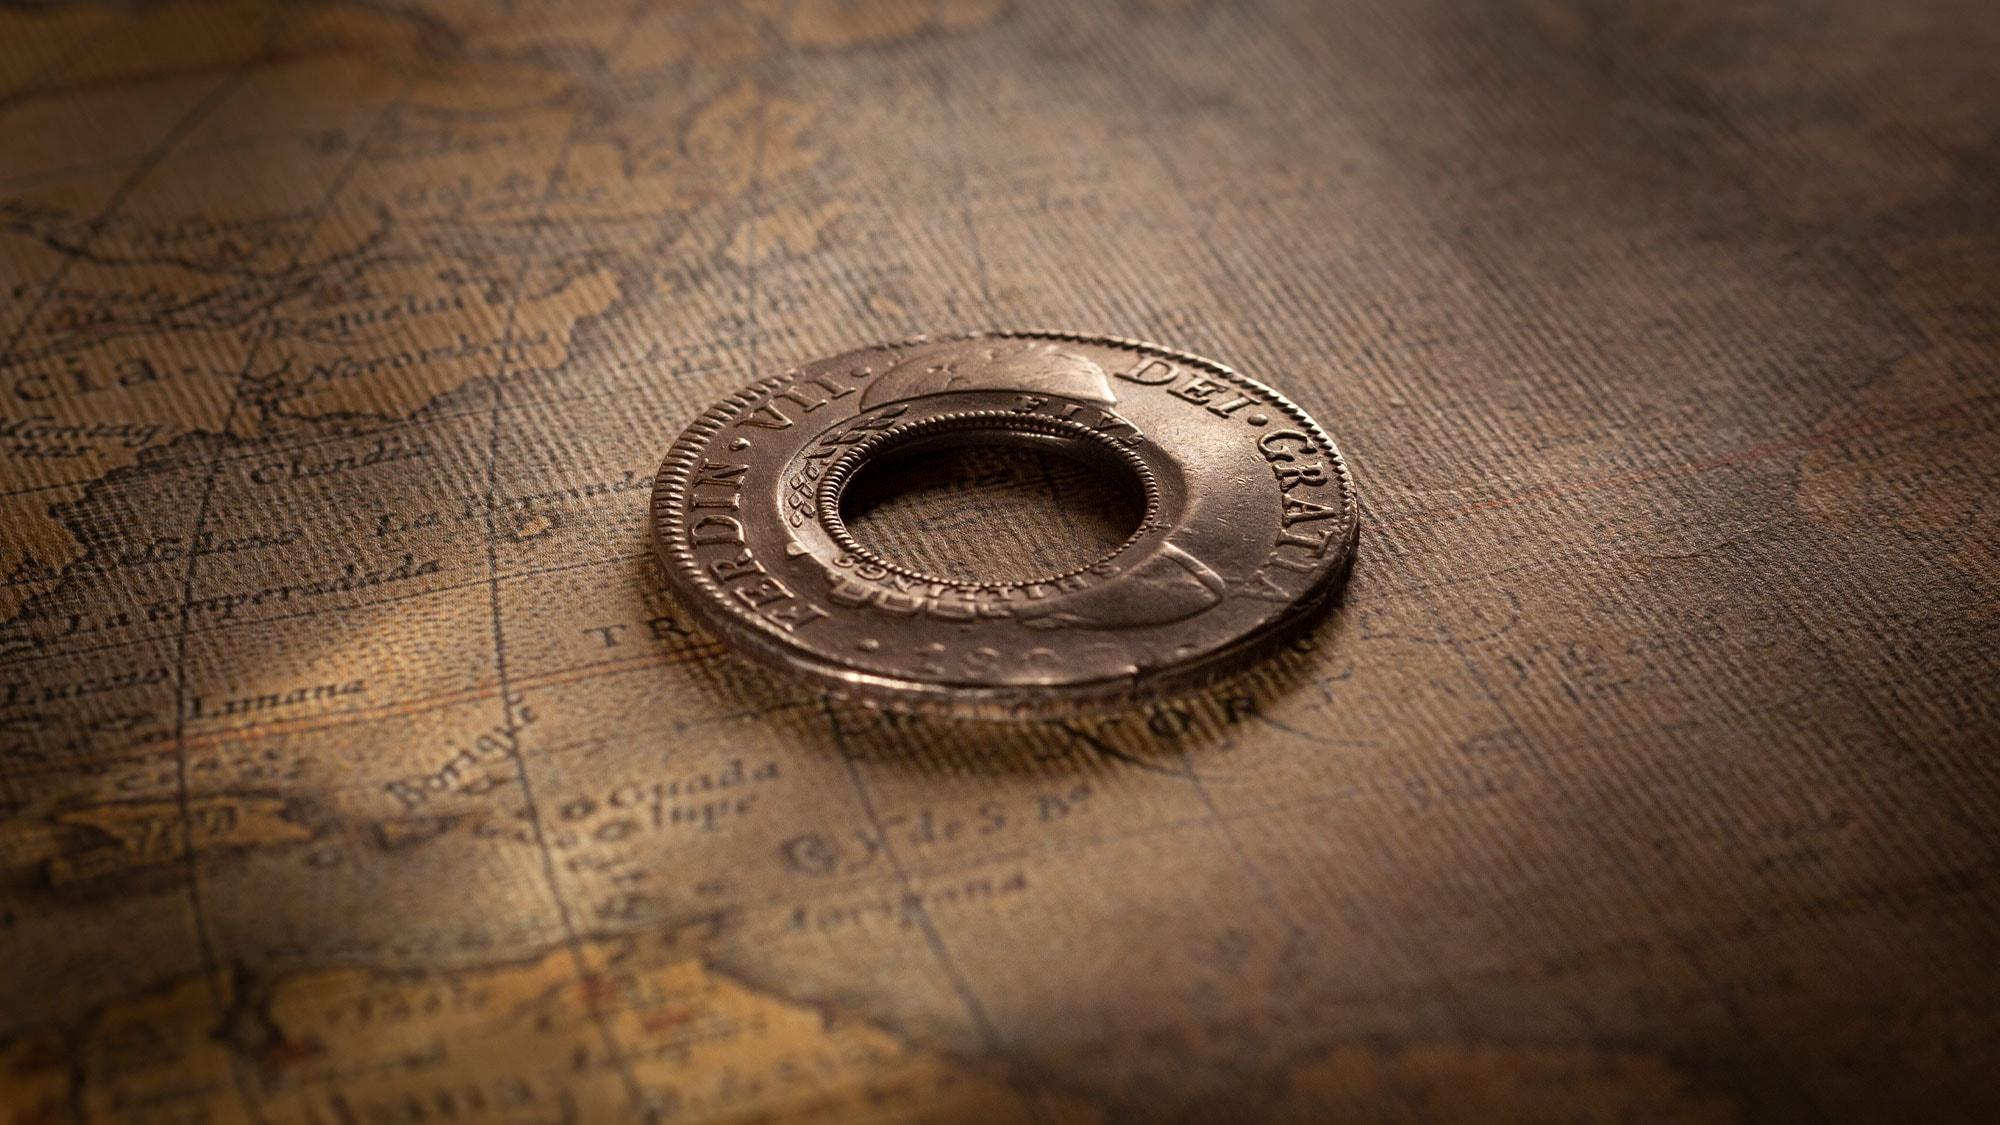 1813-Holey-Dollar-created-from-1809-Ferdinand-VII-aEF-OBV-43318-October-2021